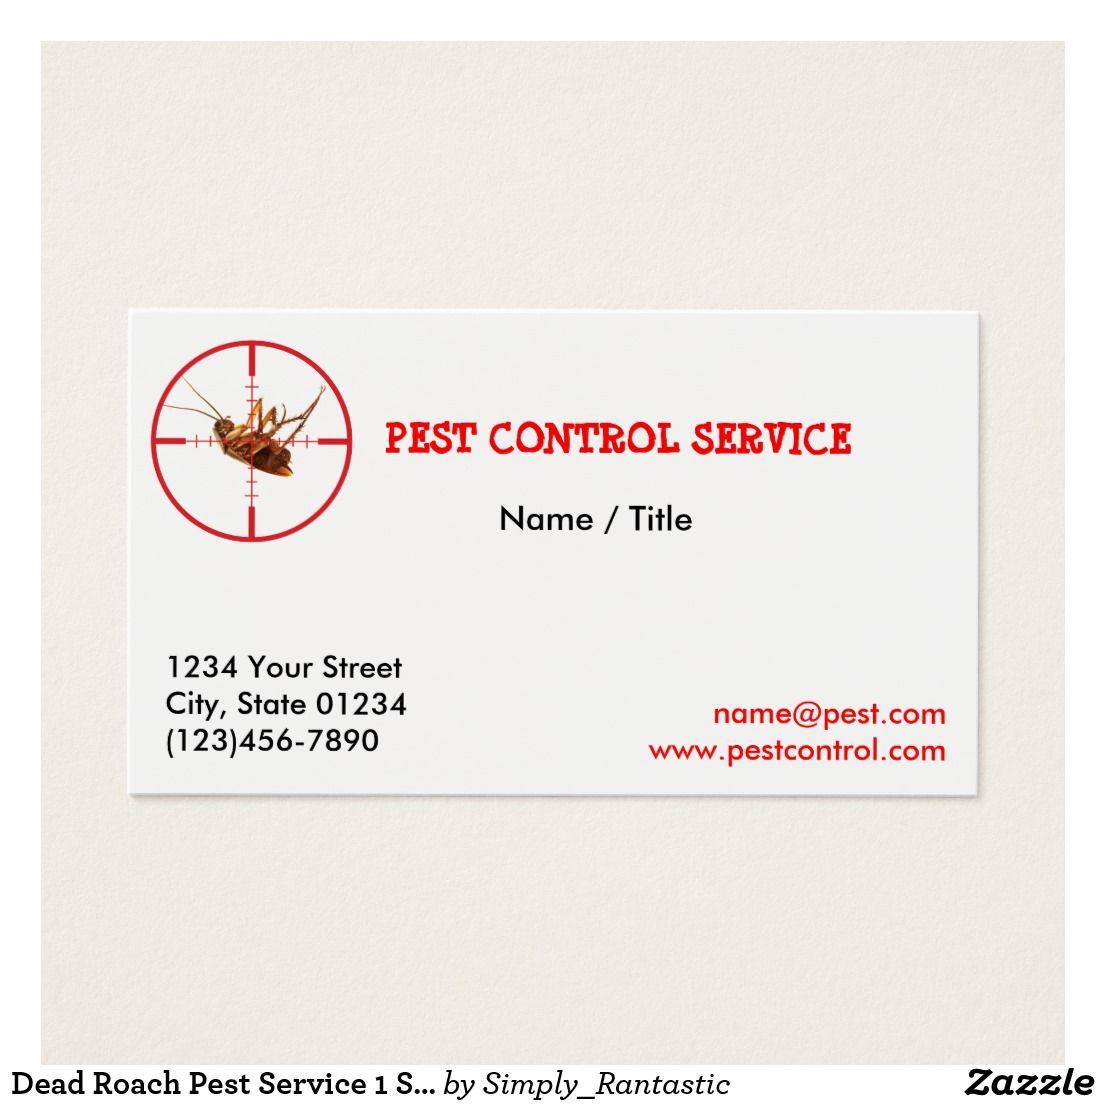 Dead Roach Pest Service 1 Sided Business Card